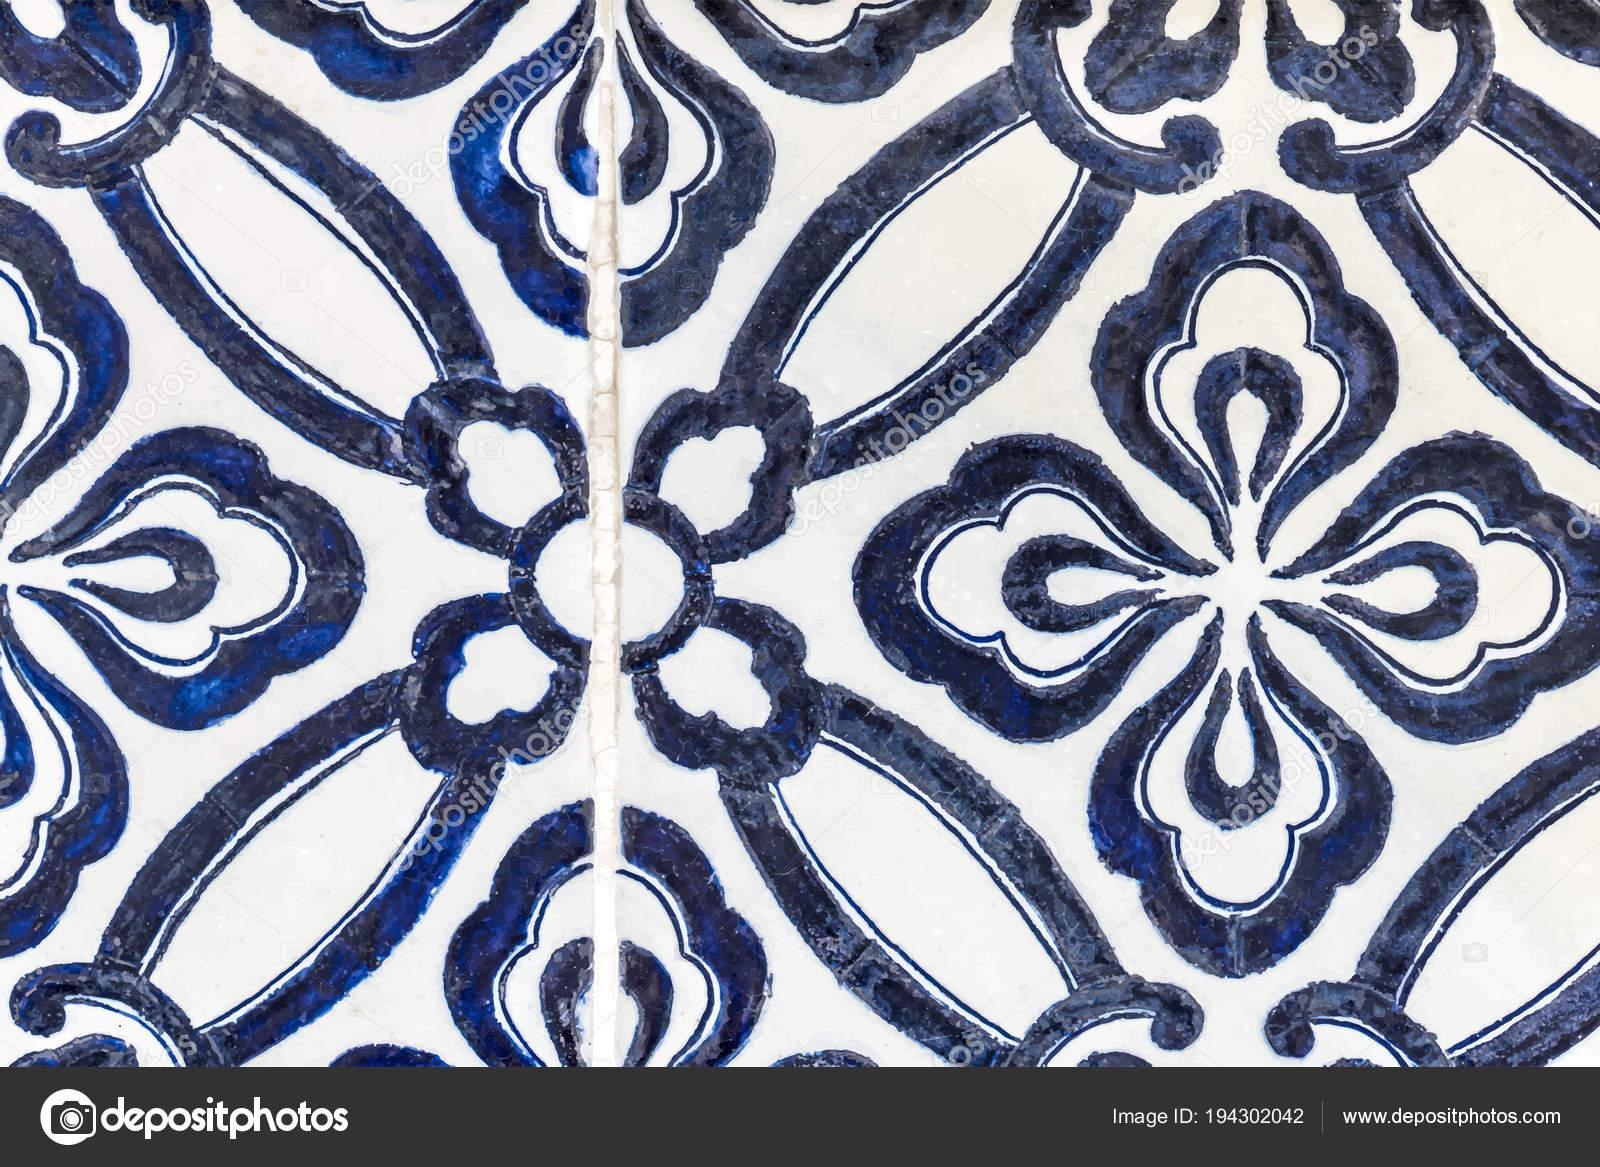 Illustration Des Boden Fliesen Muster — Stockfoto © Rawpixel #194302042